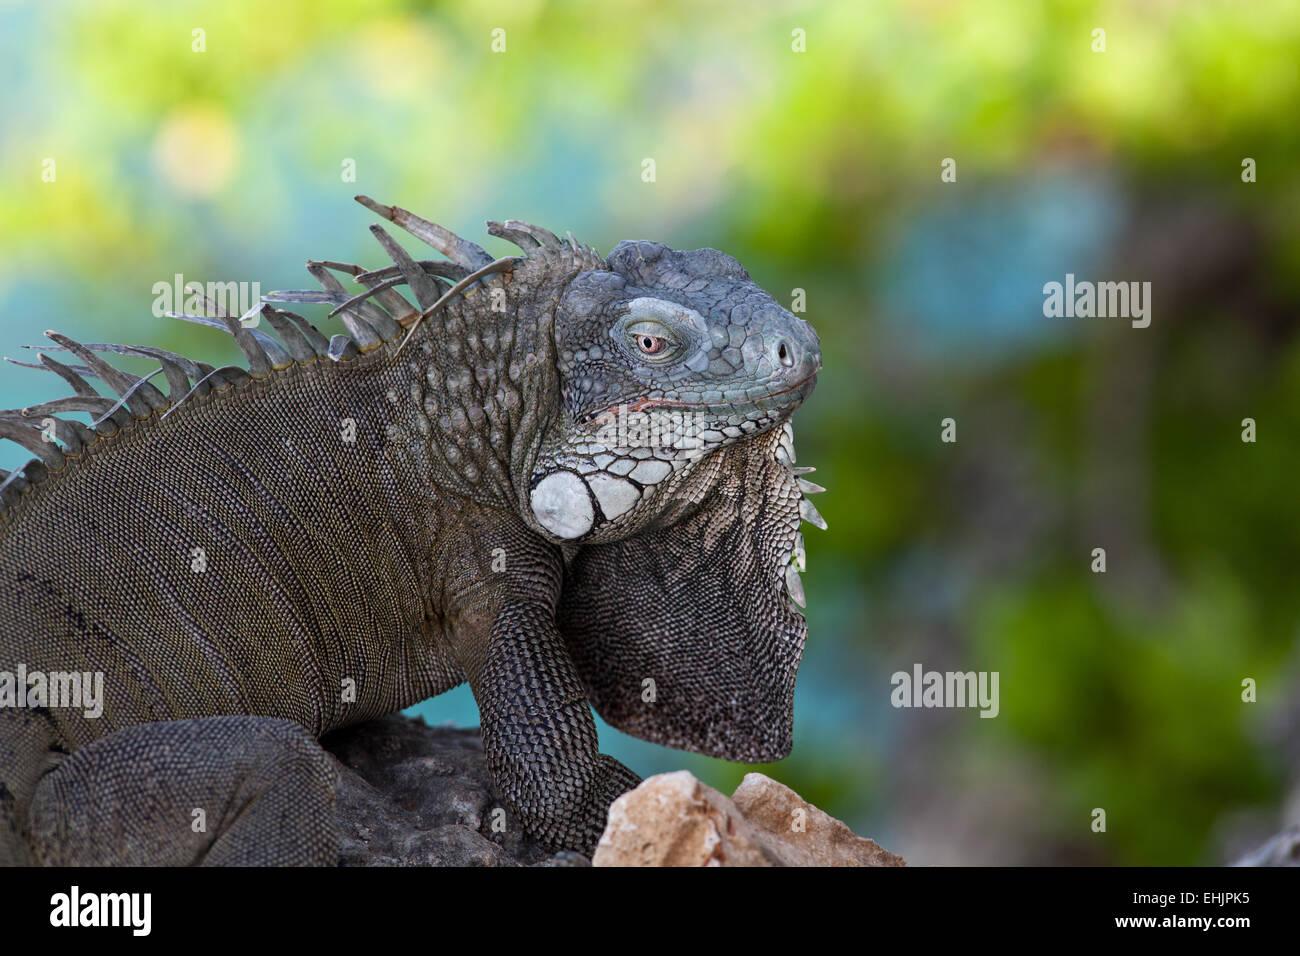 Iguane vert Banque D'Images